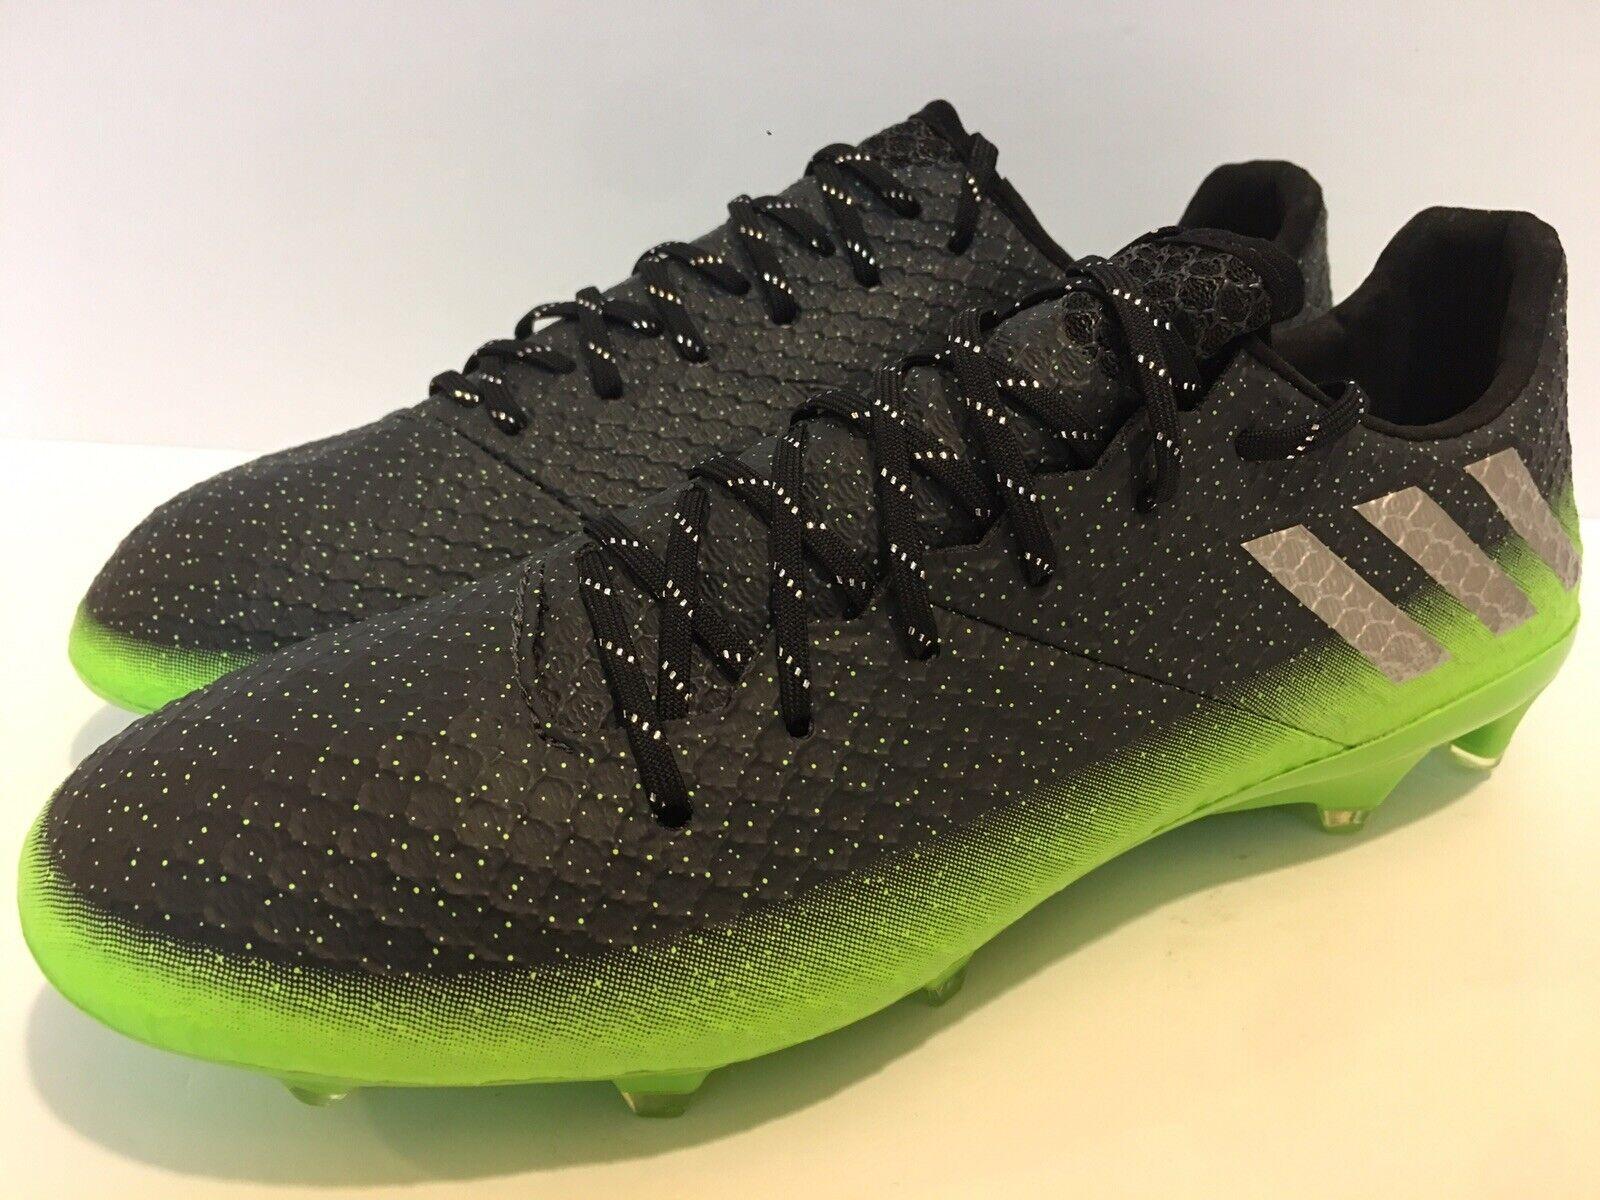 Adidas Messi 16.1 FG Space Dust Soccer Cleats Taille Pour des hommes 9